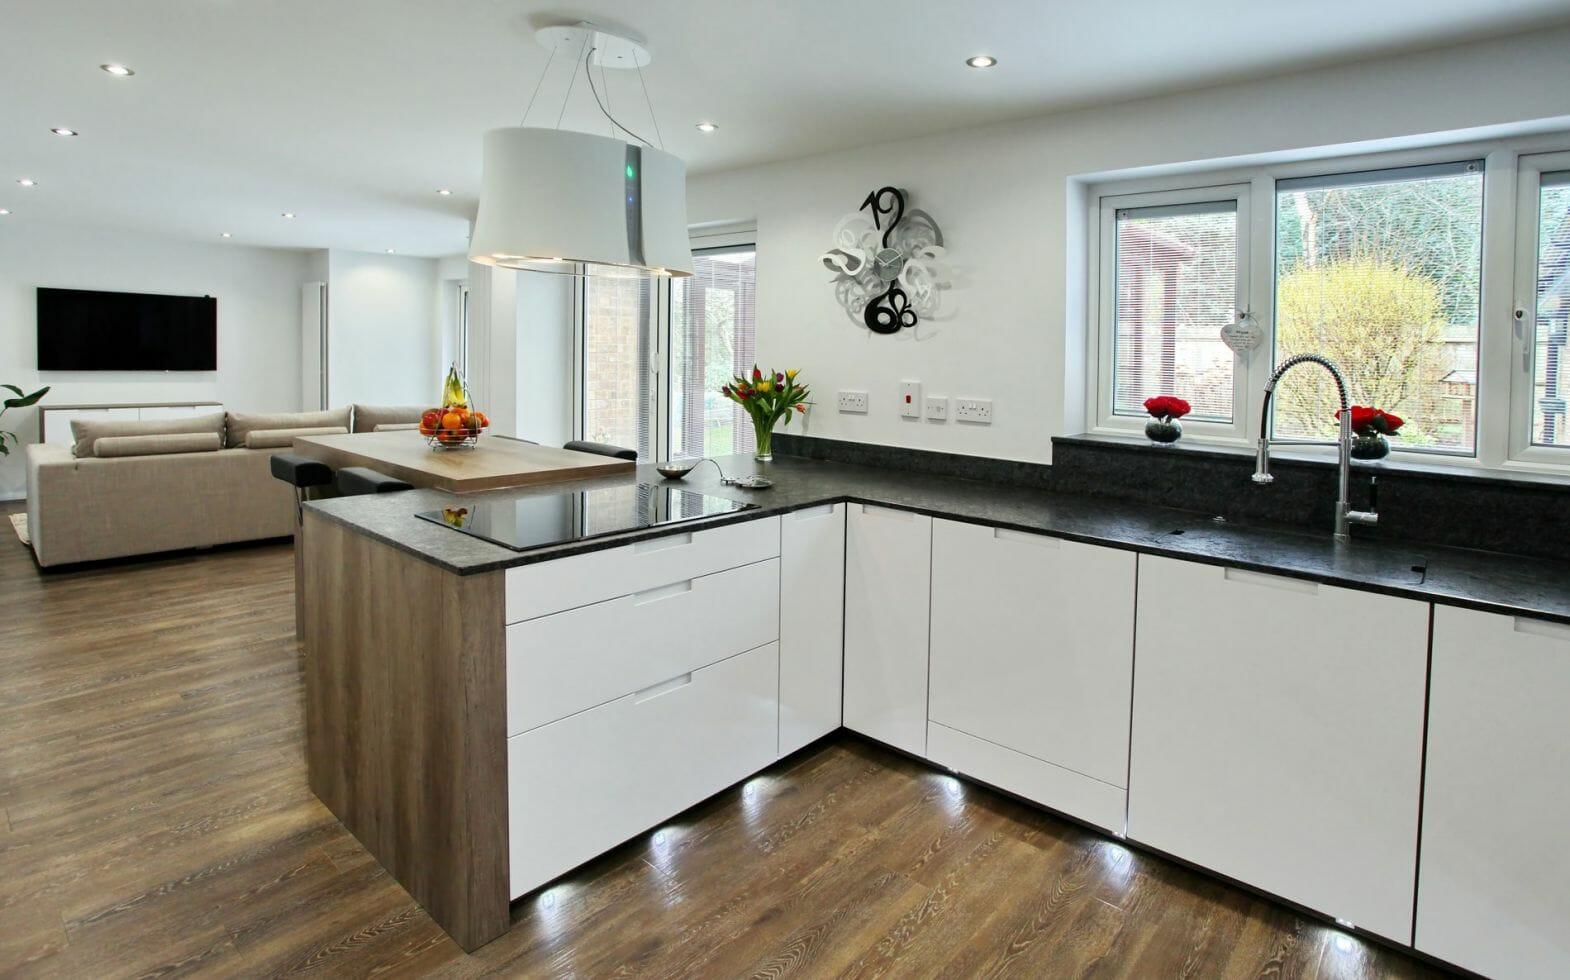 Kitchen example 2